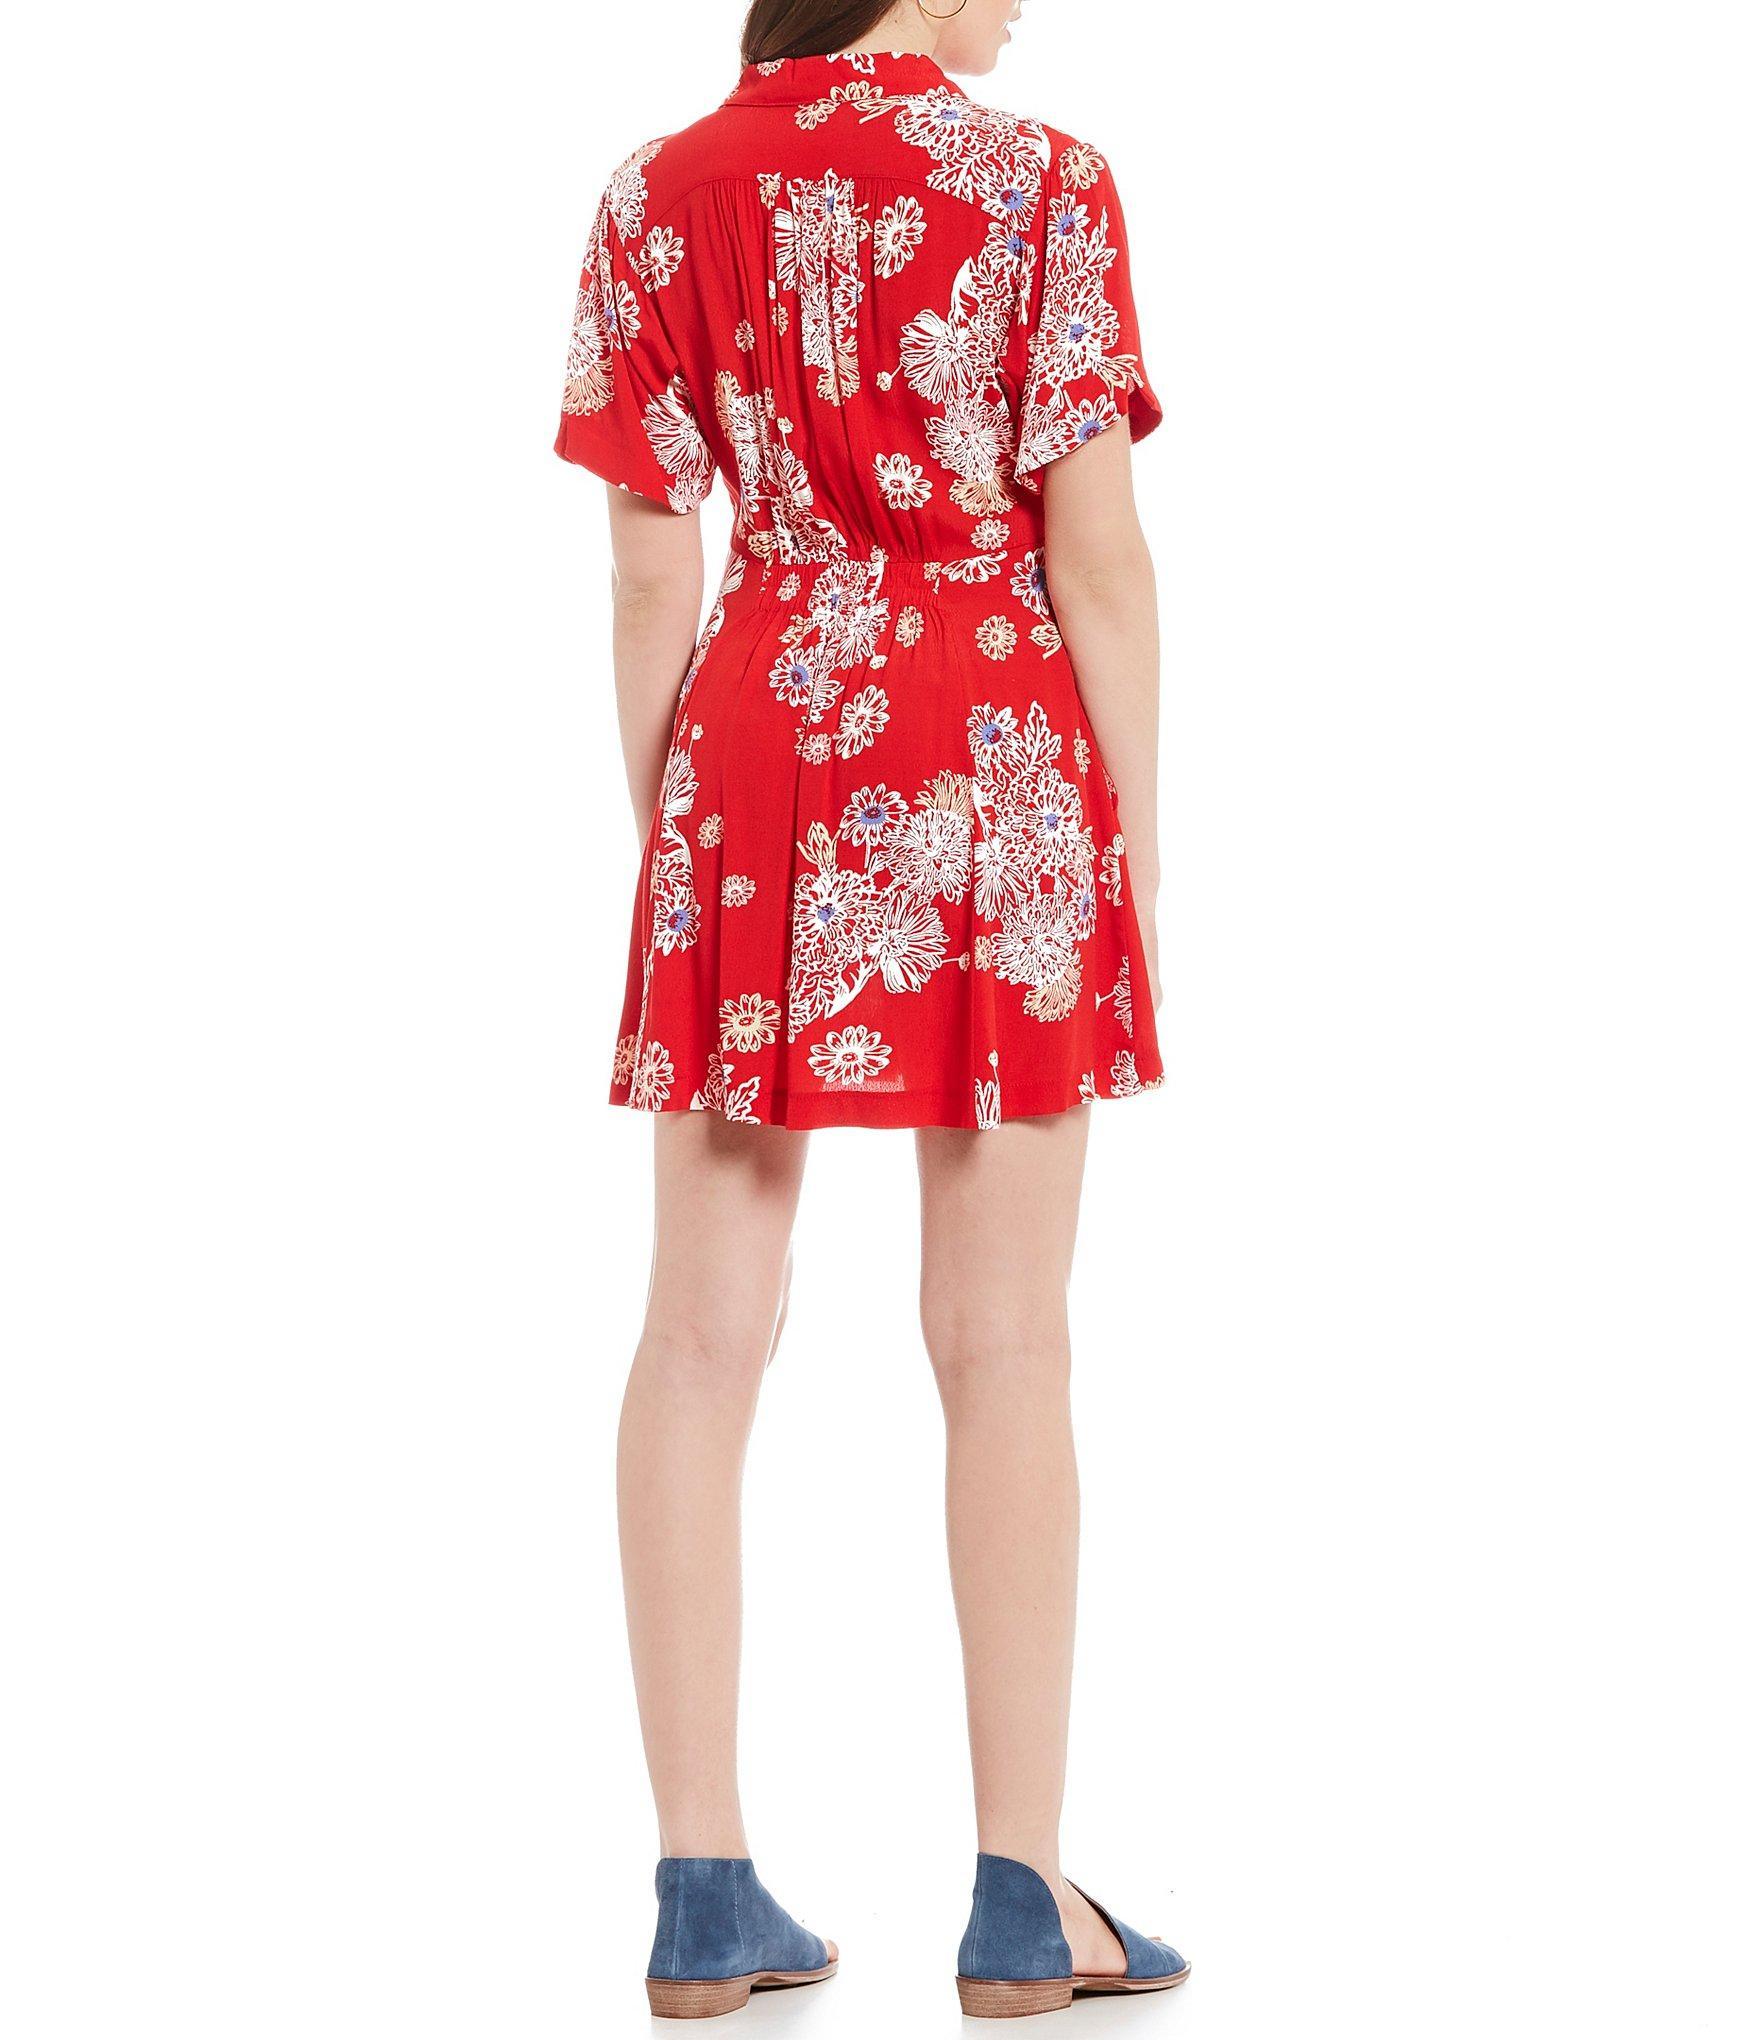 03f00254e2a Free People Hawaii Floral Print A-line Mini Dress in Red - Lyst